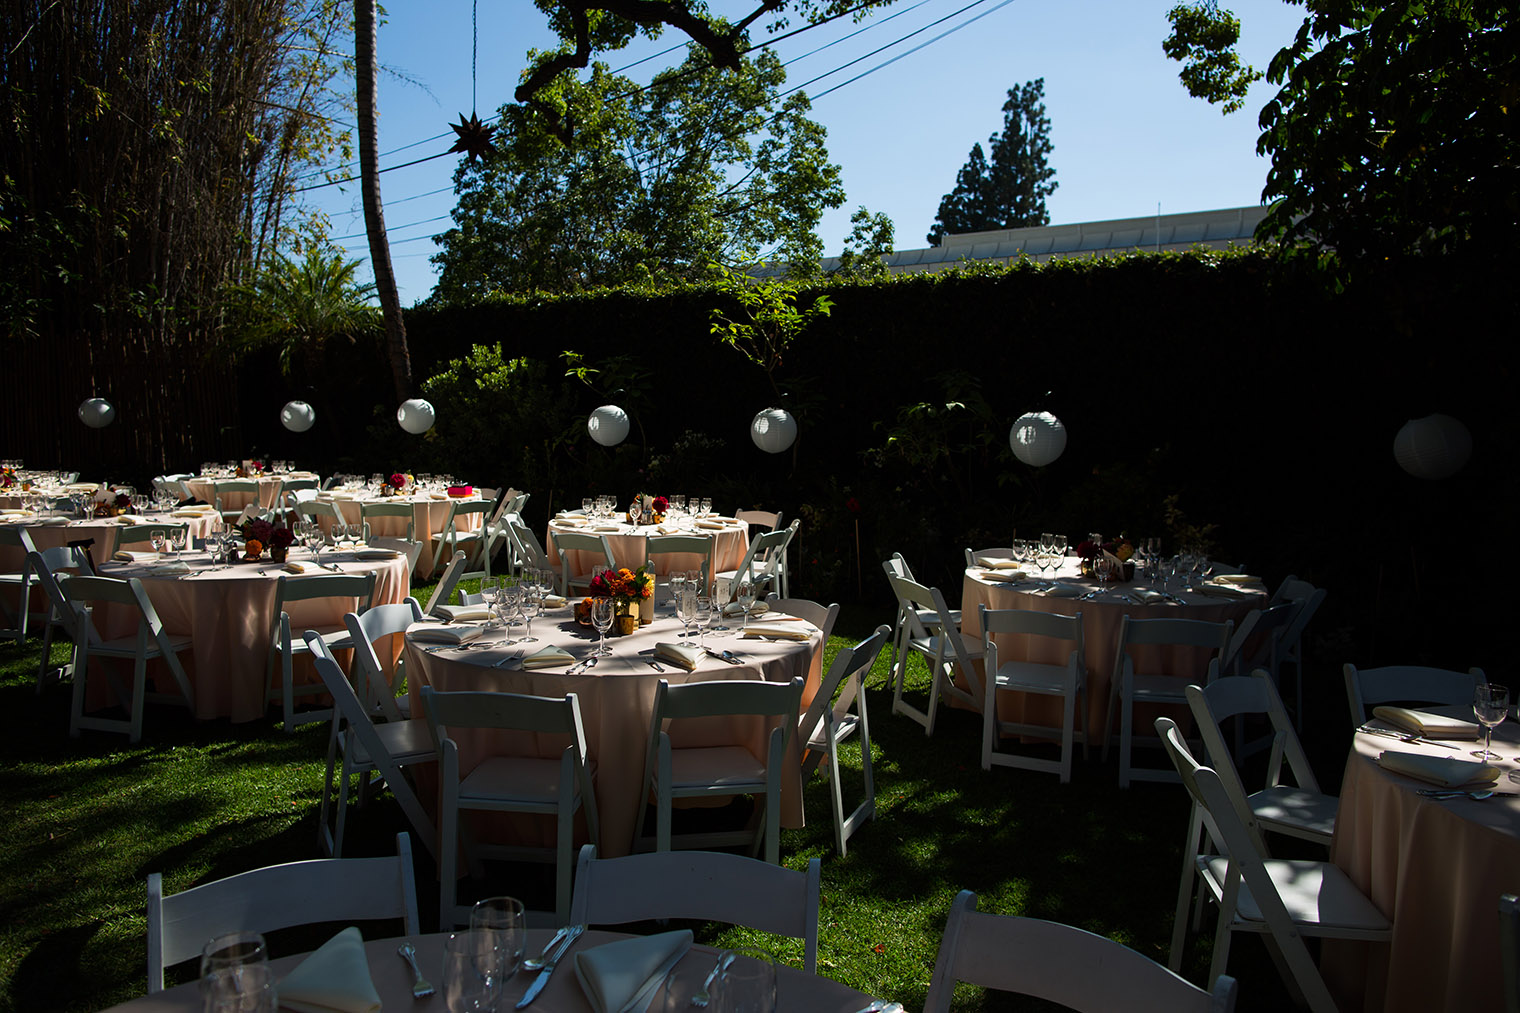 reception at Happy Trails Cafe & Garden